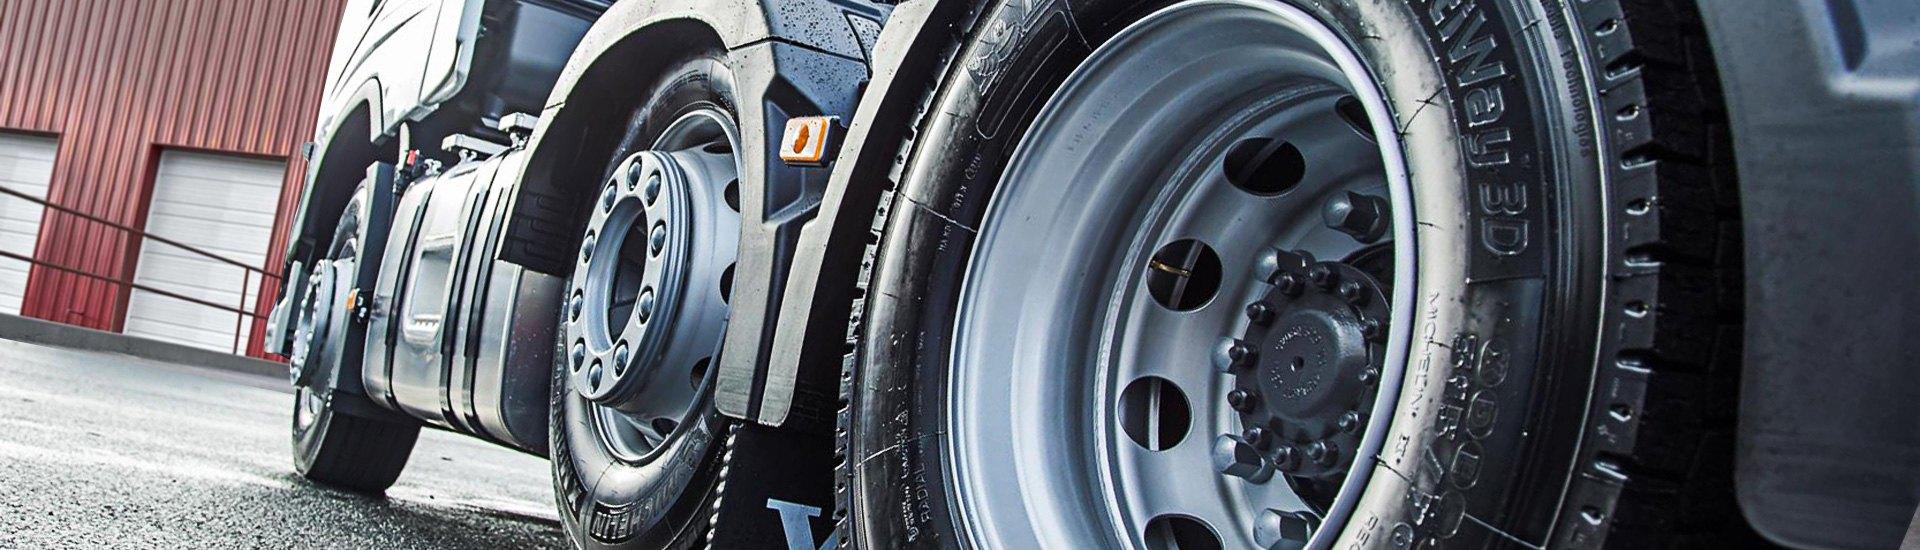 Freightliner Cascadia Wheels Tires Truckid Com